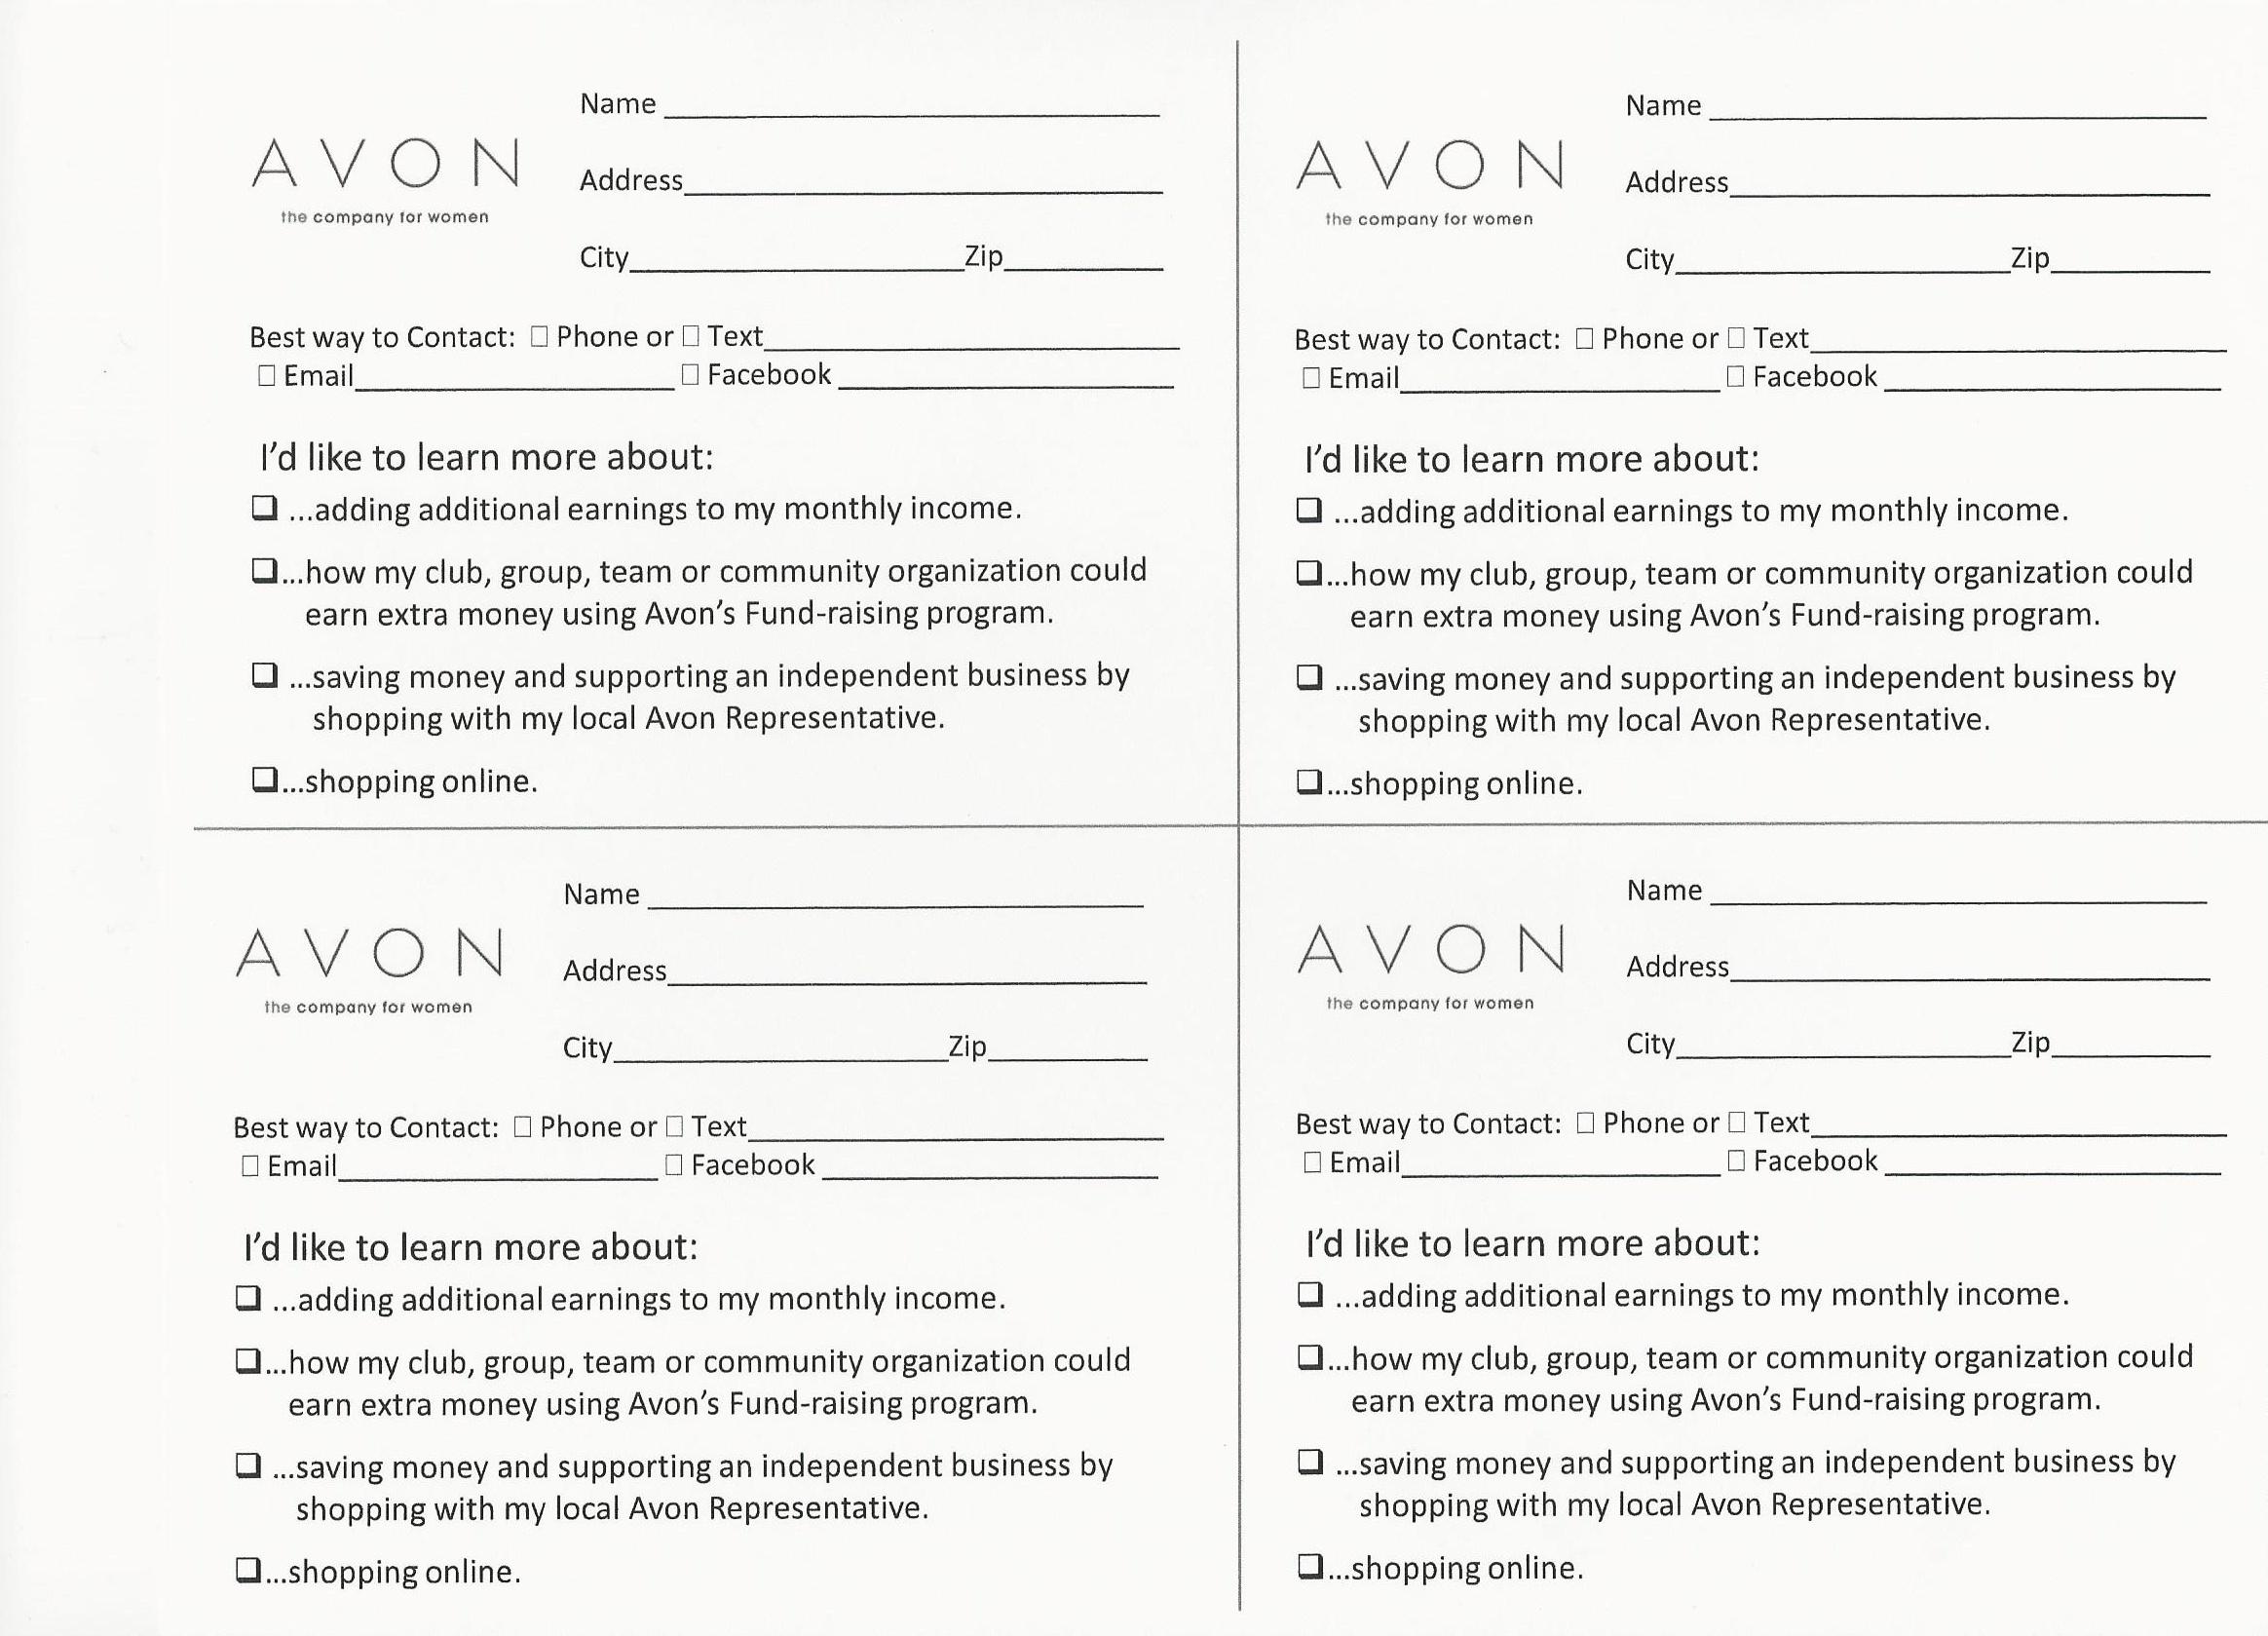 Avon Flyers & Charts   Avon Beauty - Free Printable Avon Flyers